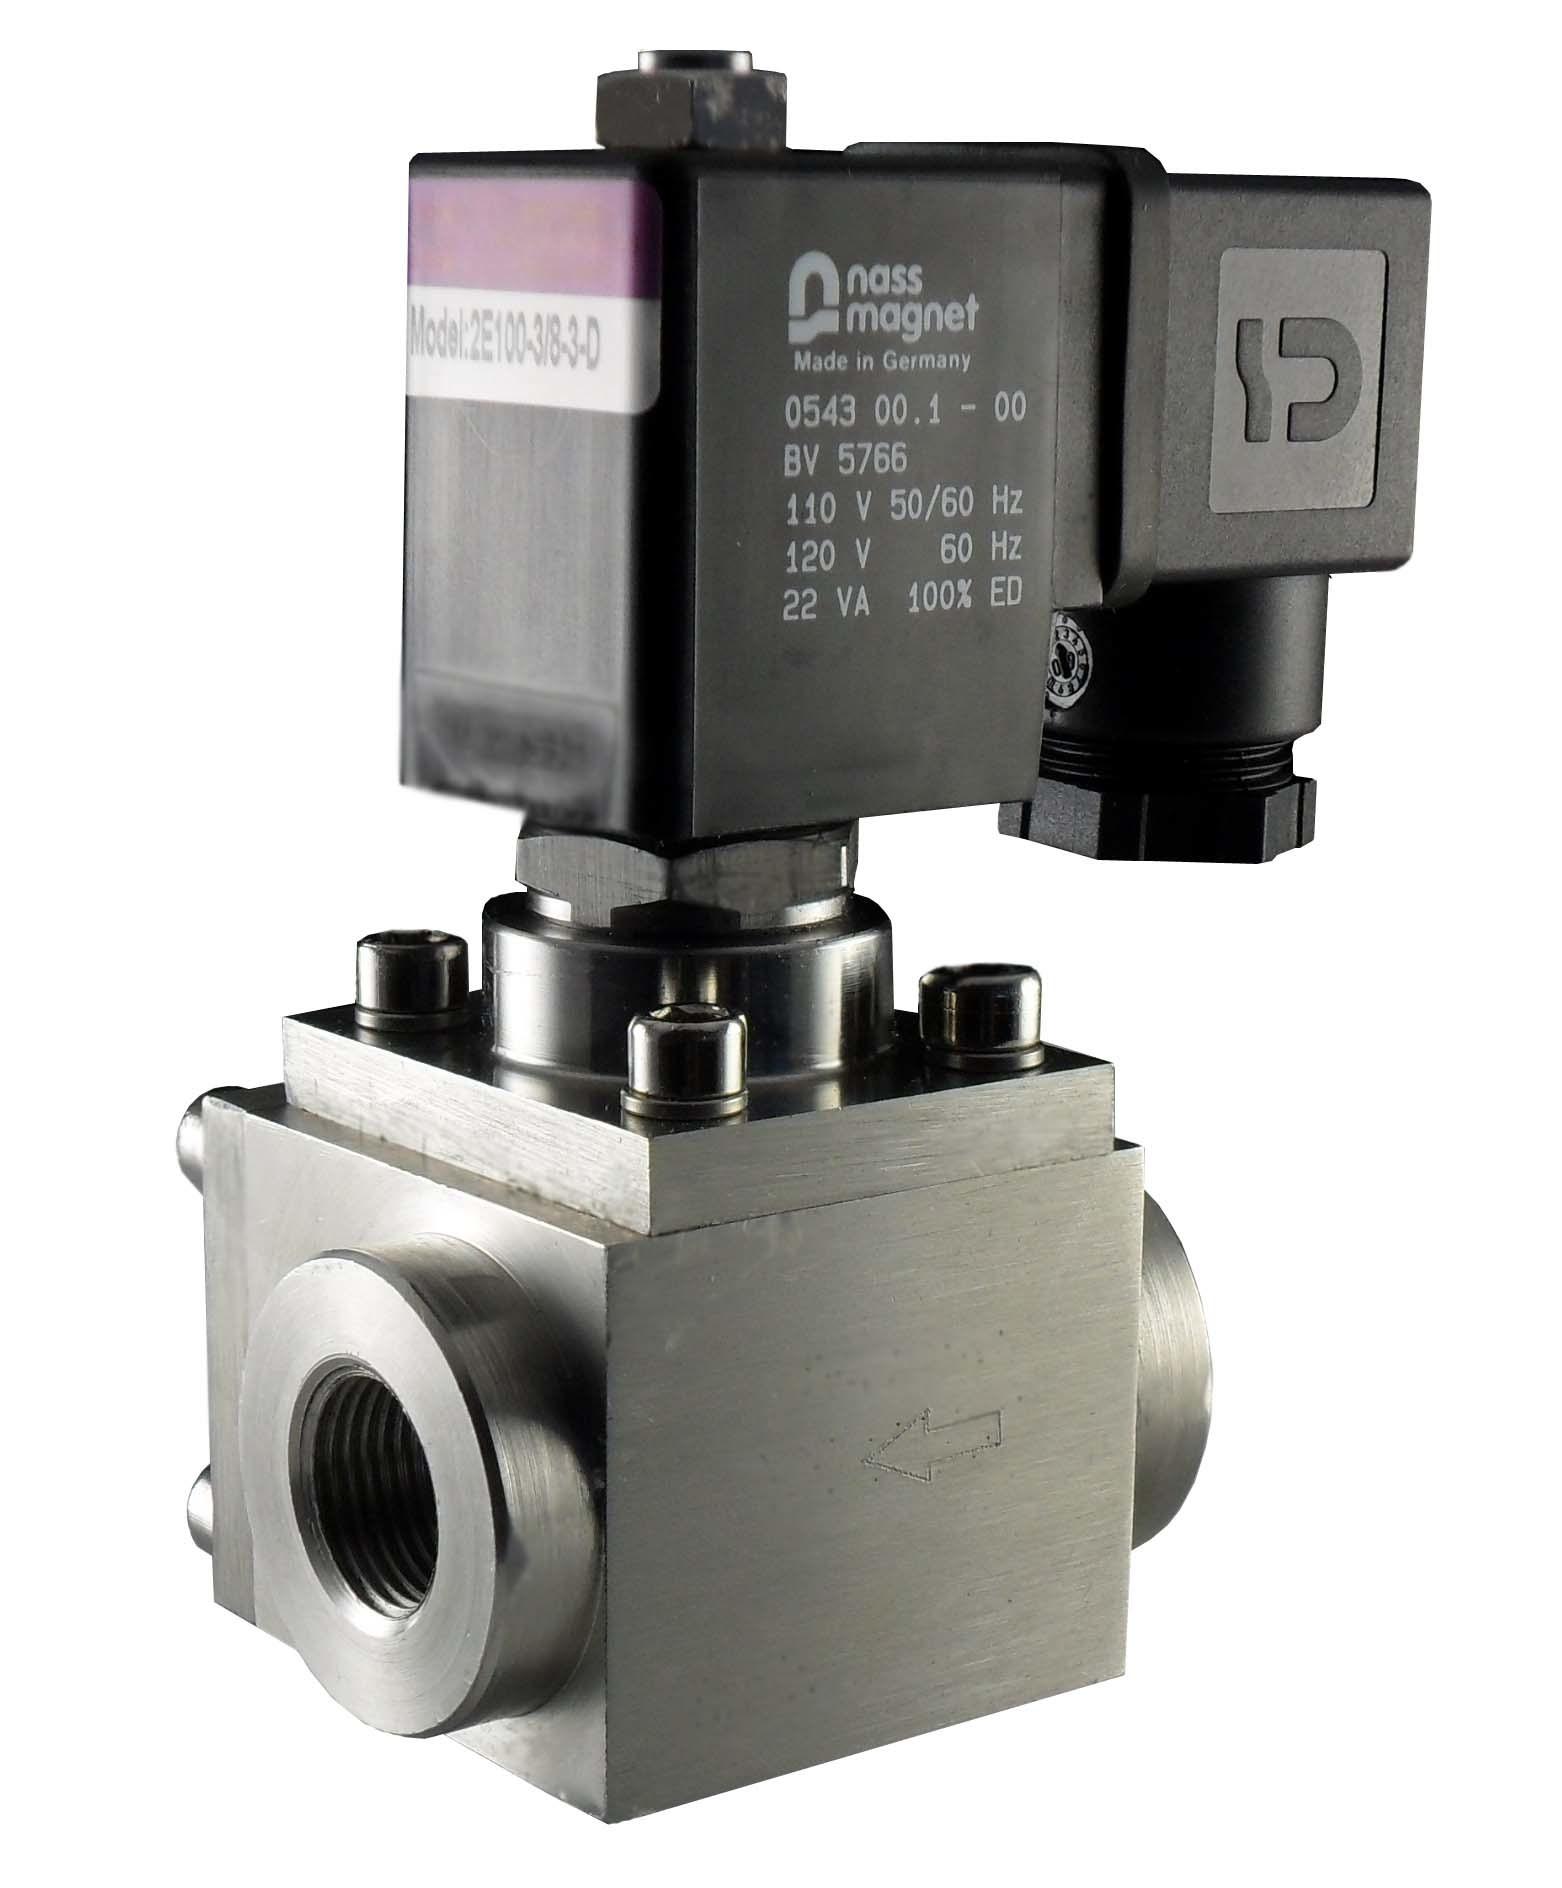 High pressure valve meddic